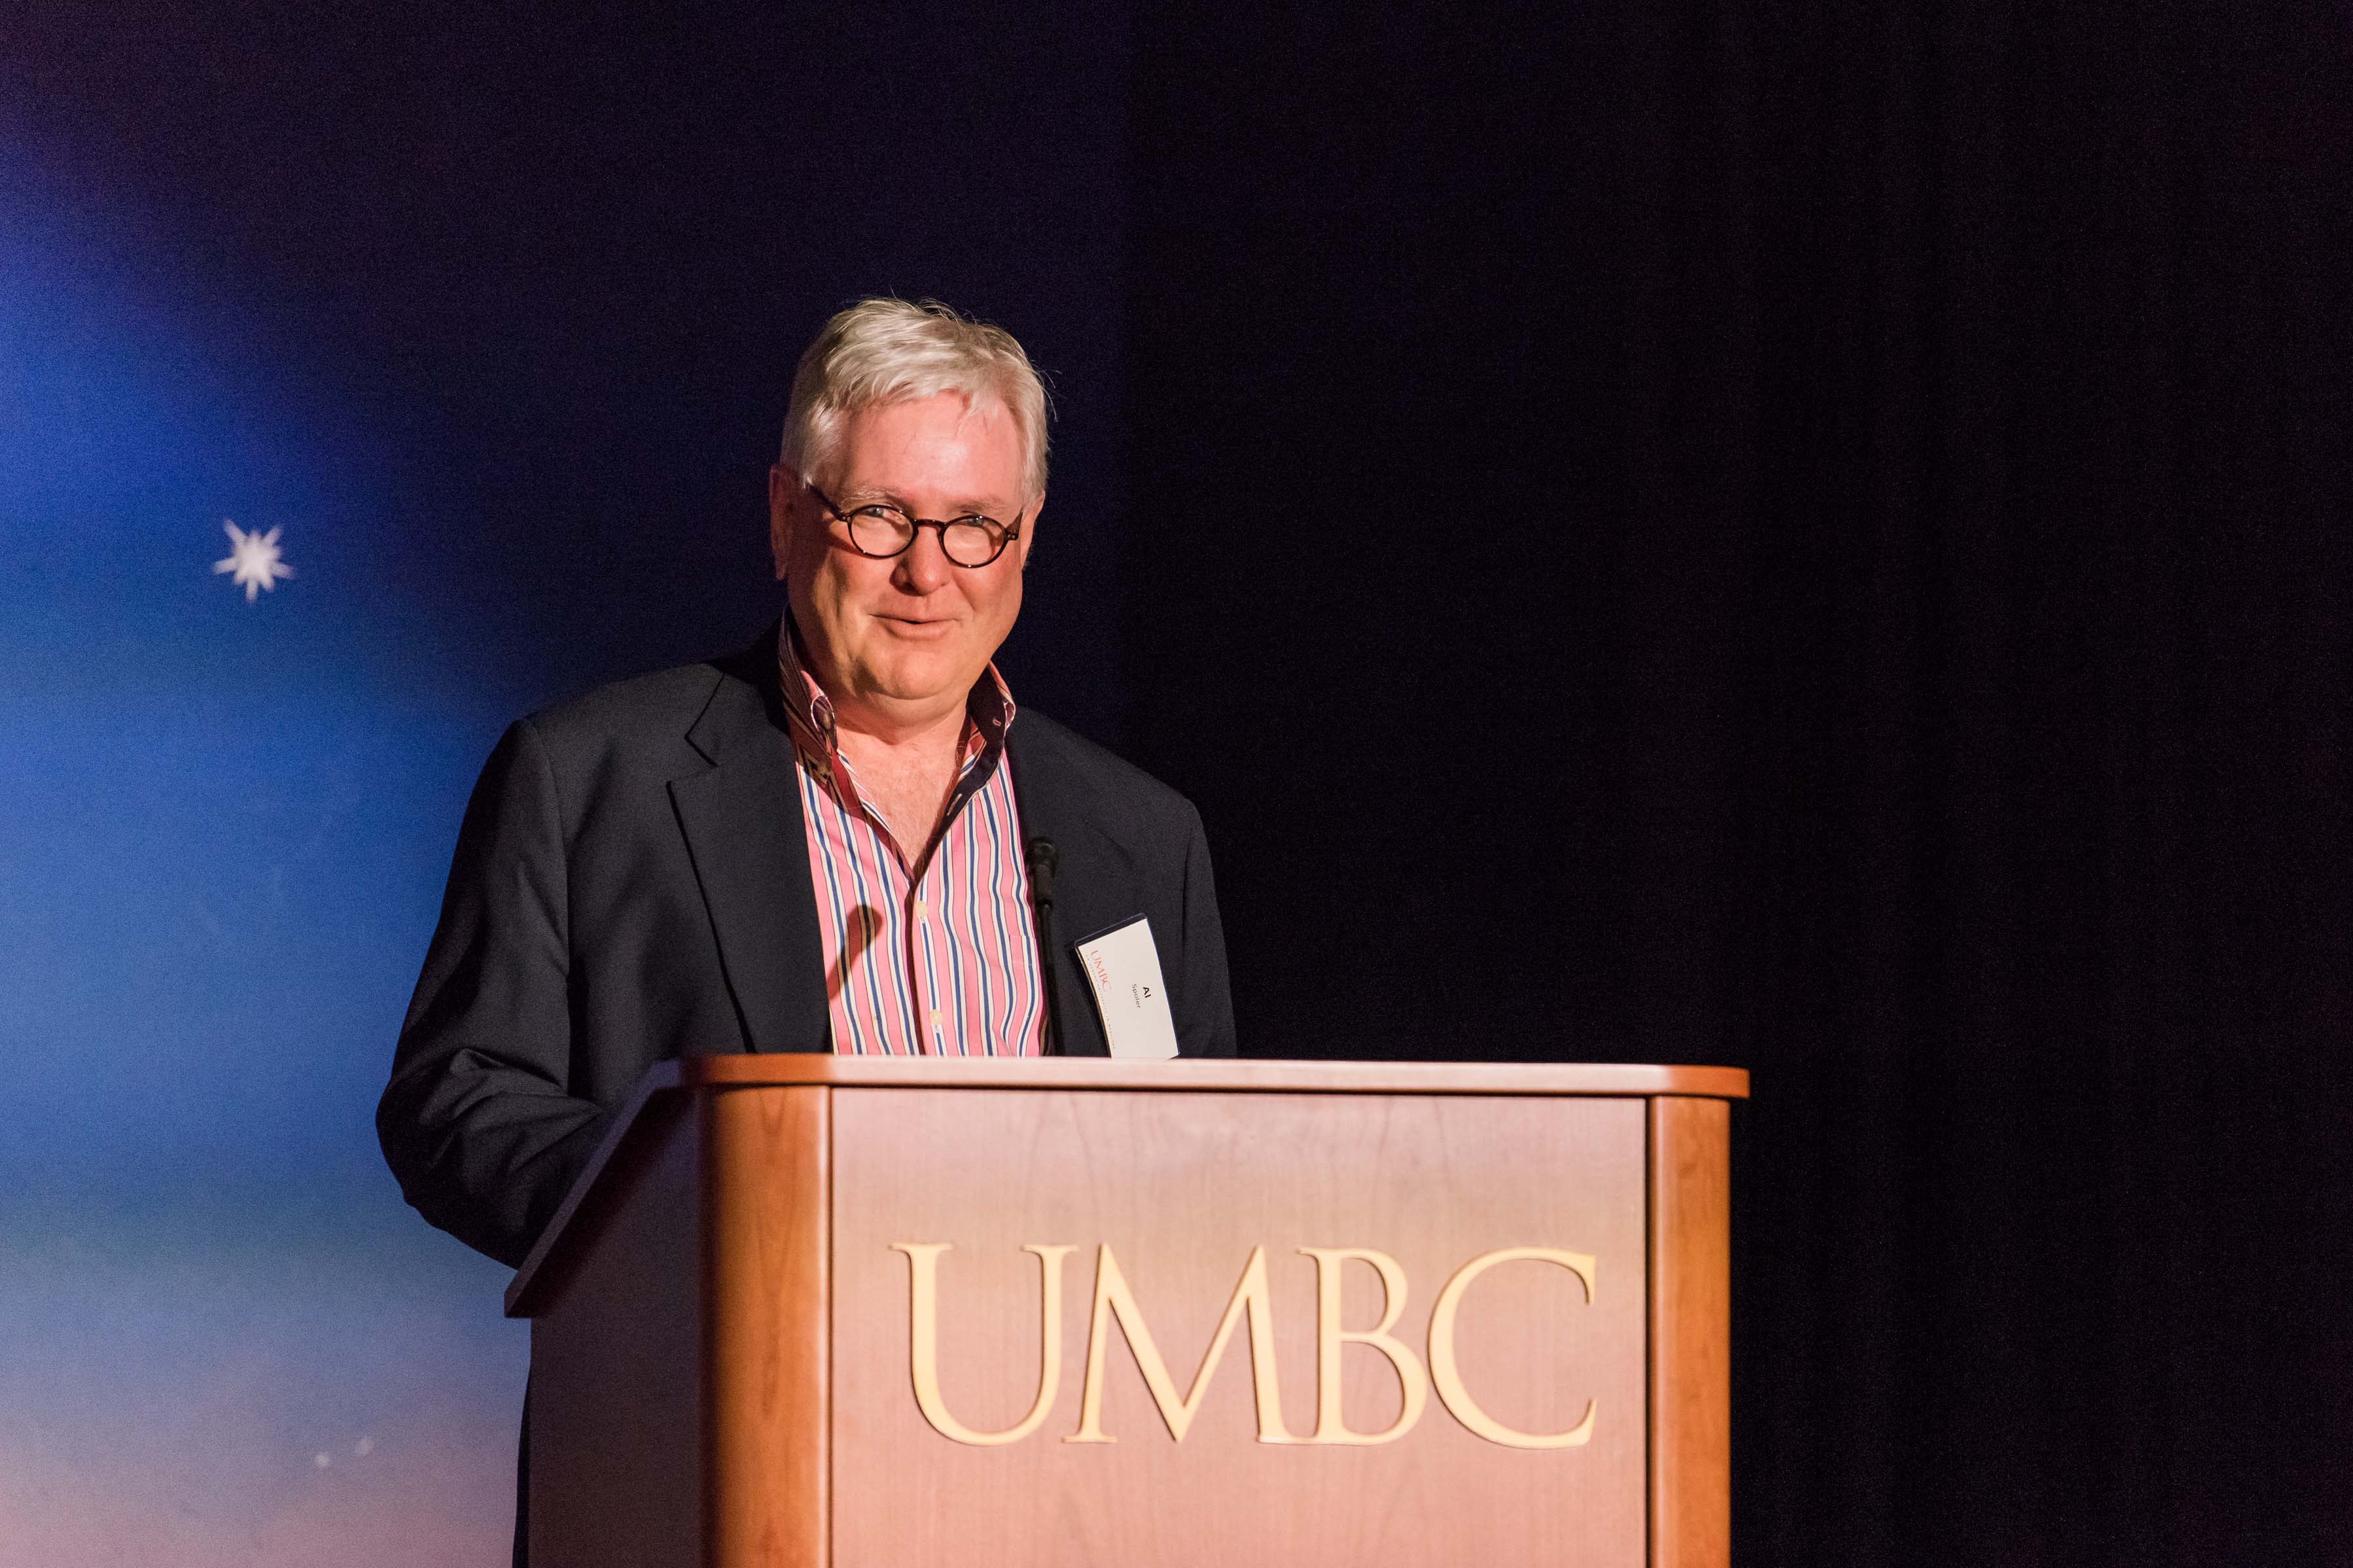 Al Spoler gives talk behind UMBC podium at wine tasting event